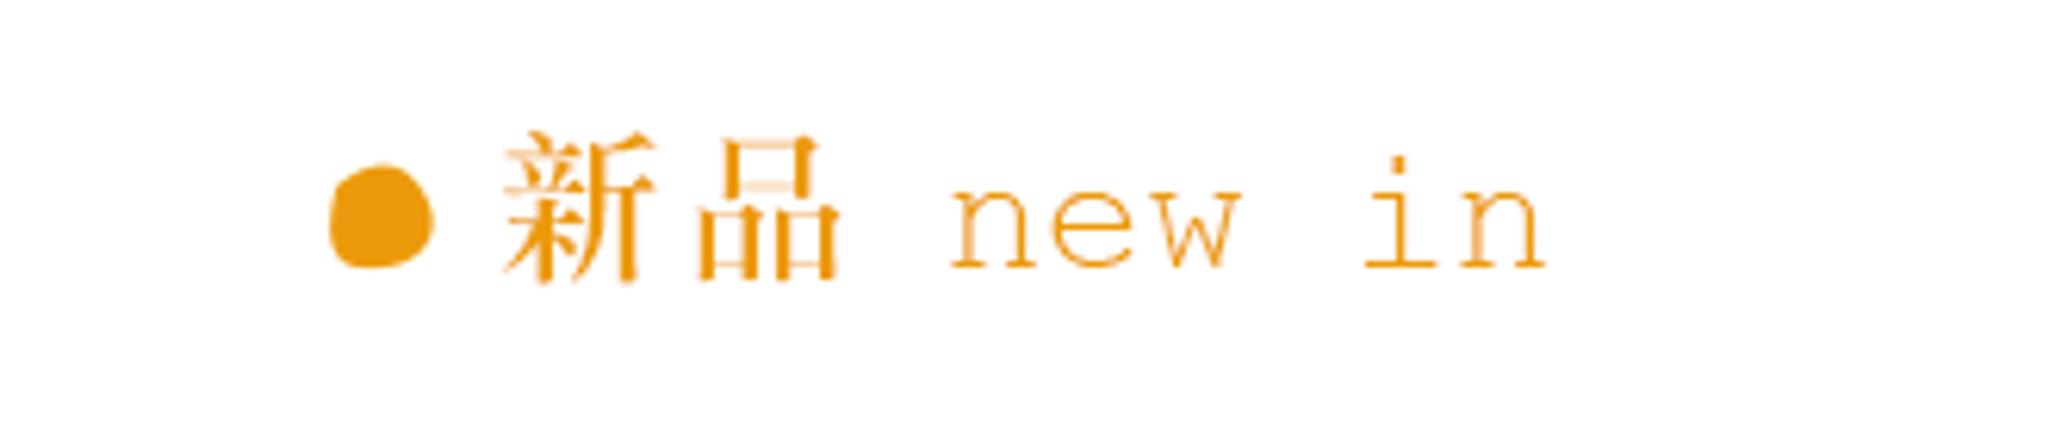 新品 / NEW